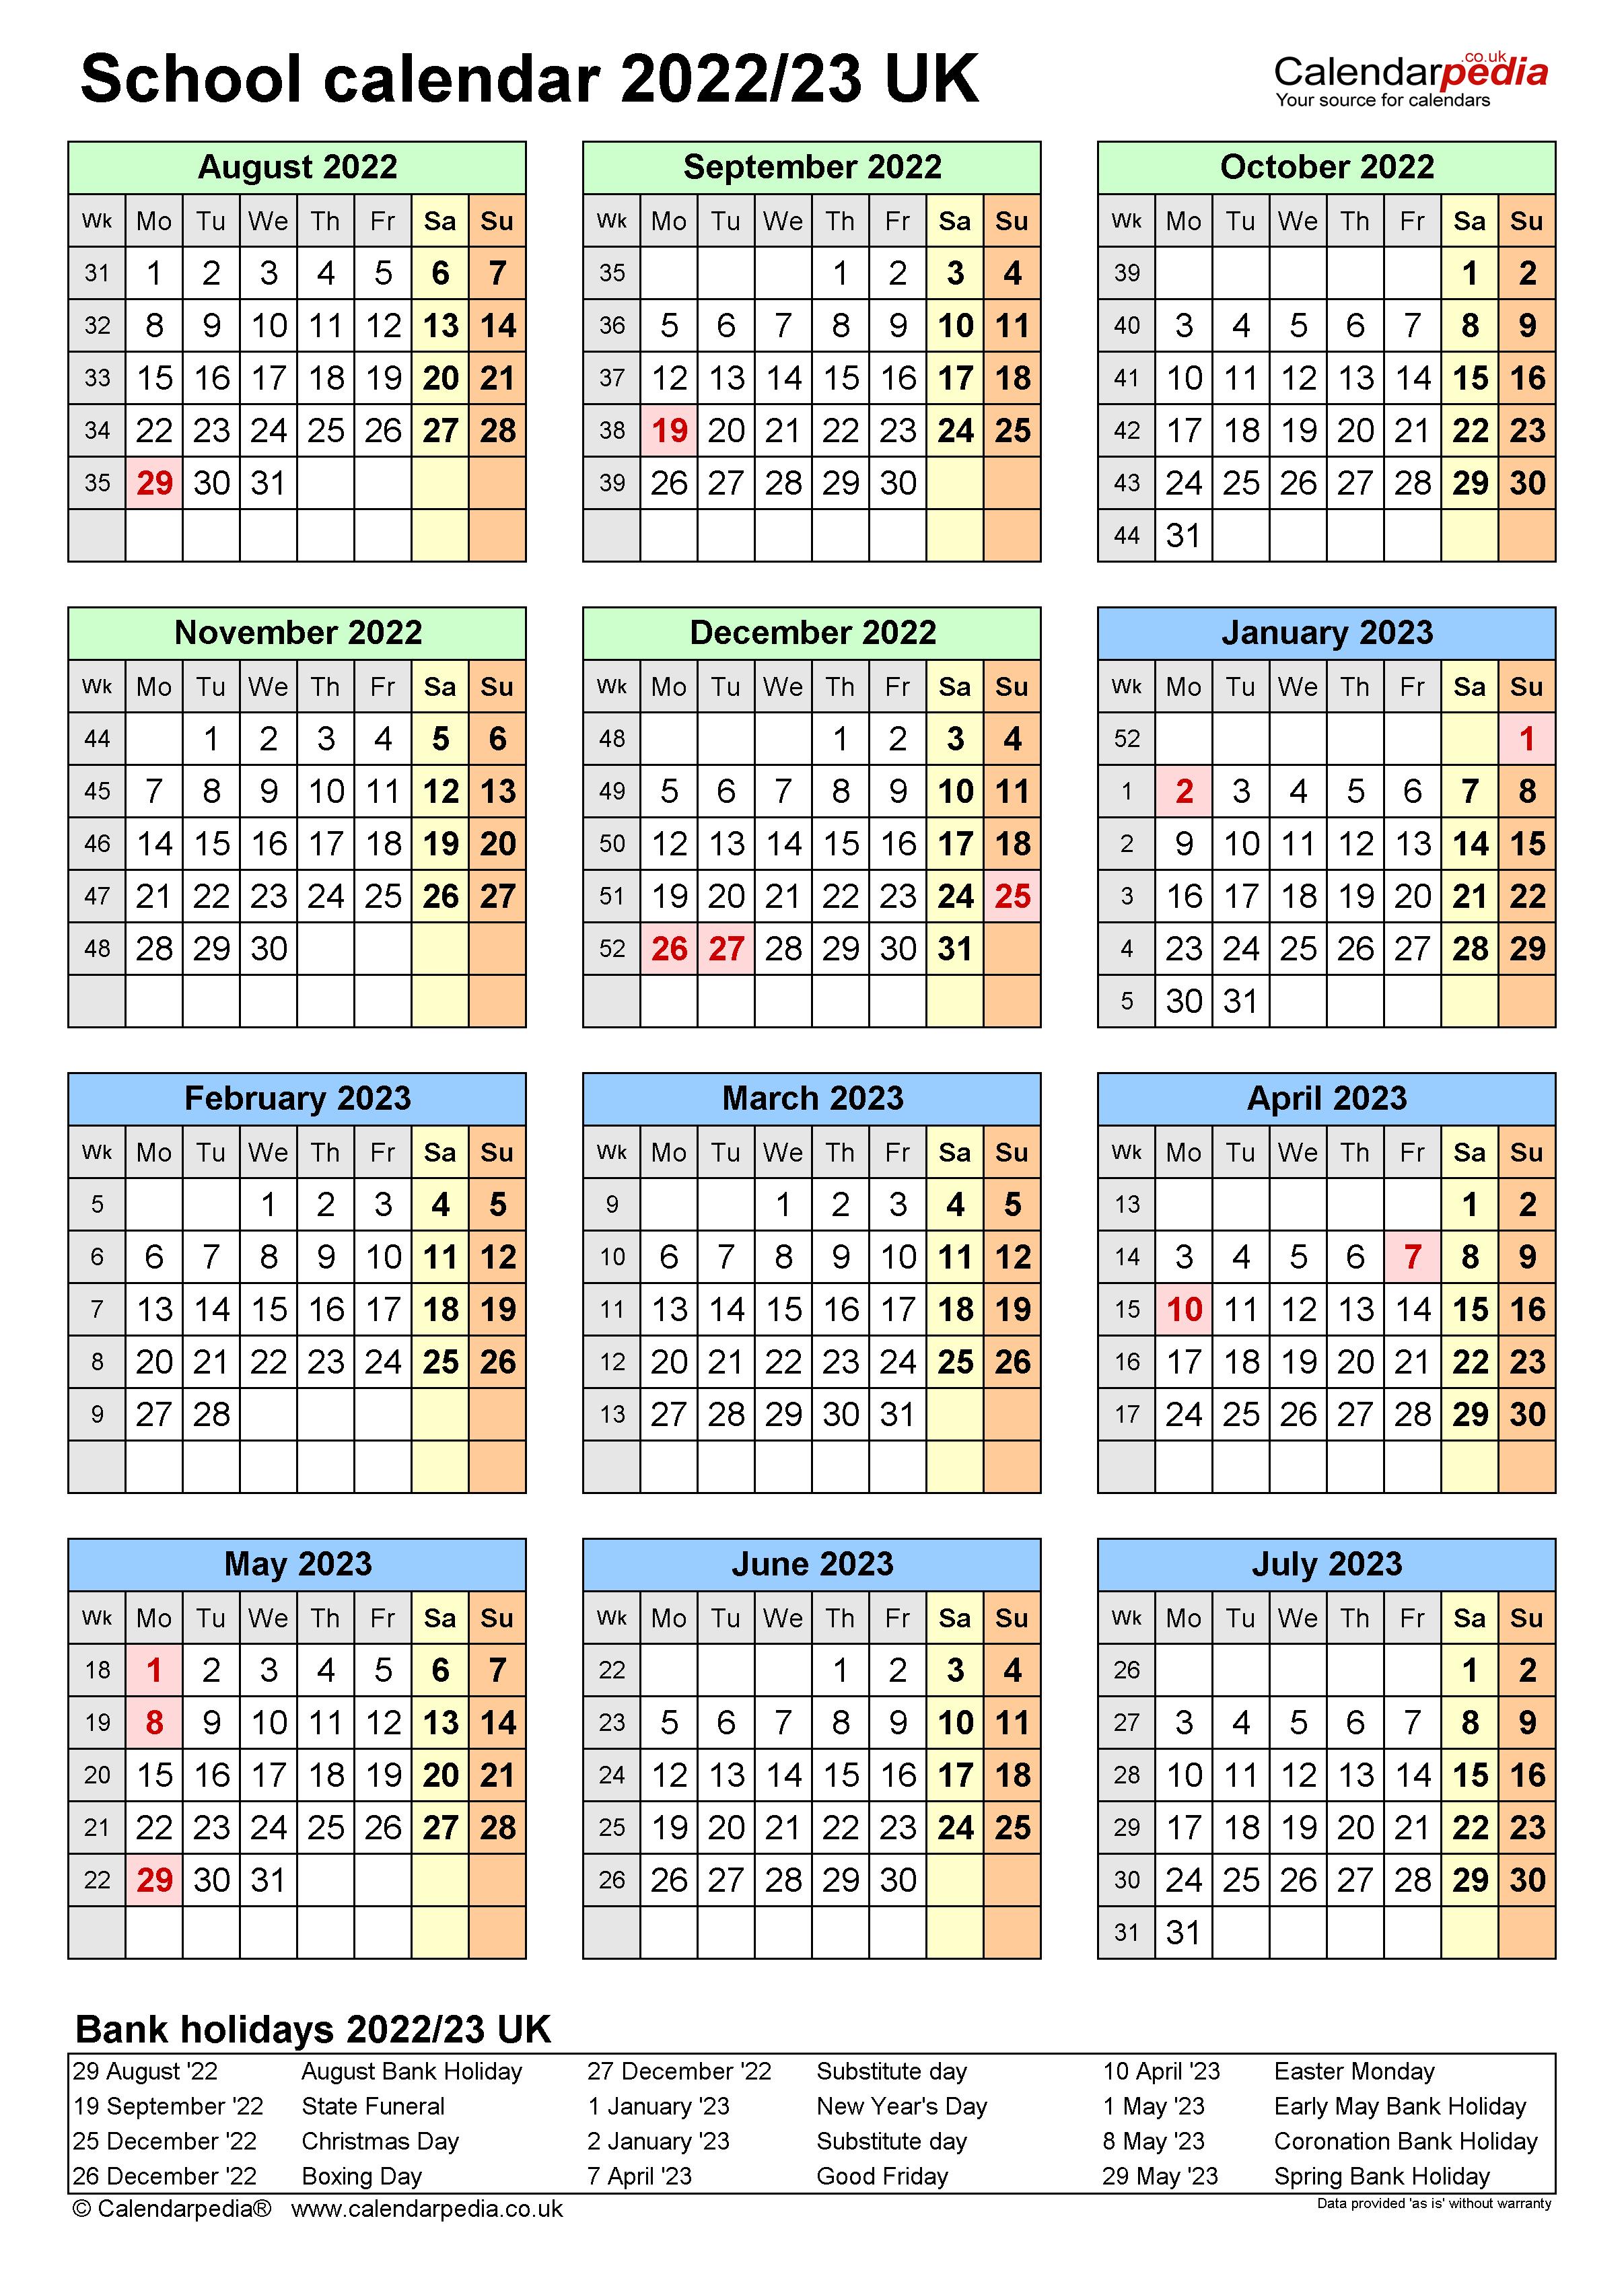 Unc Academic Calendar 2022 23.School Calendars 2022 23 Uk Free Printable Excel Templates